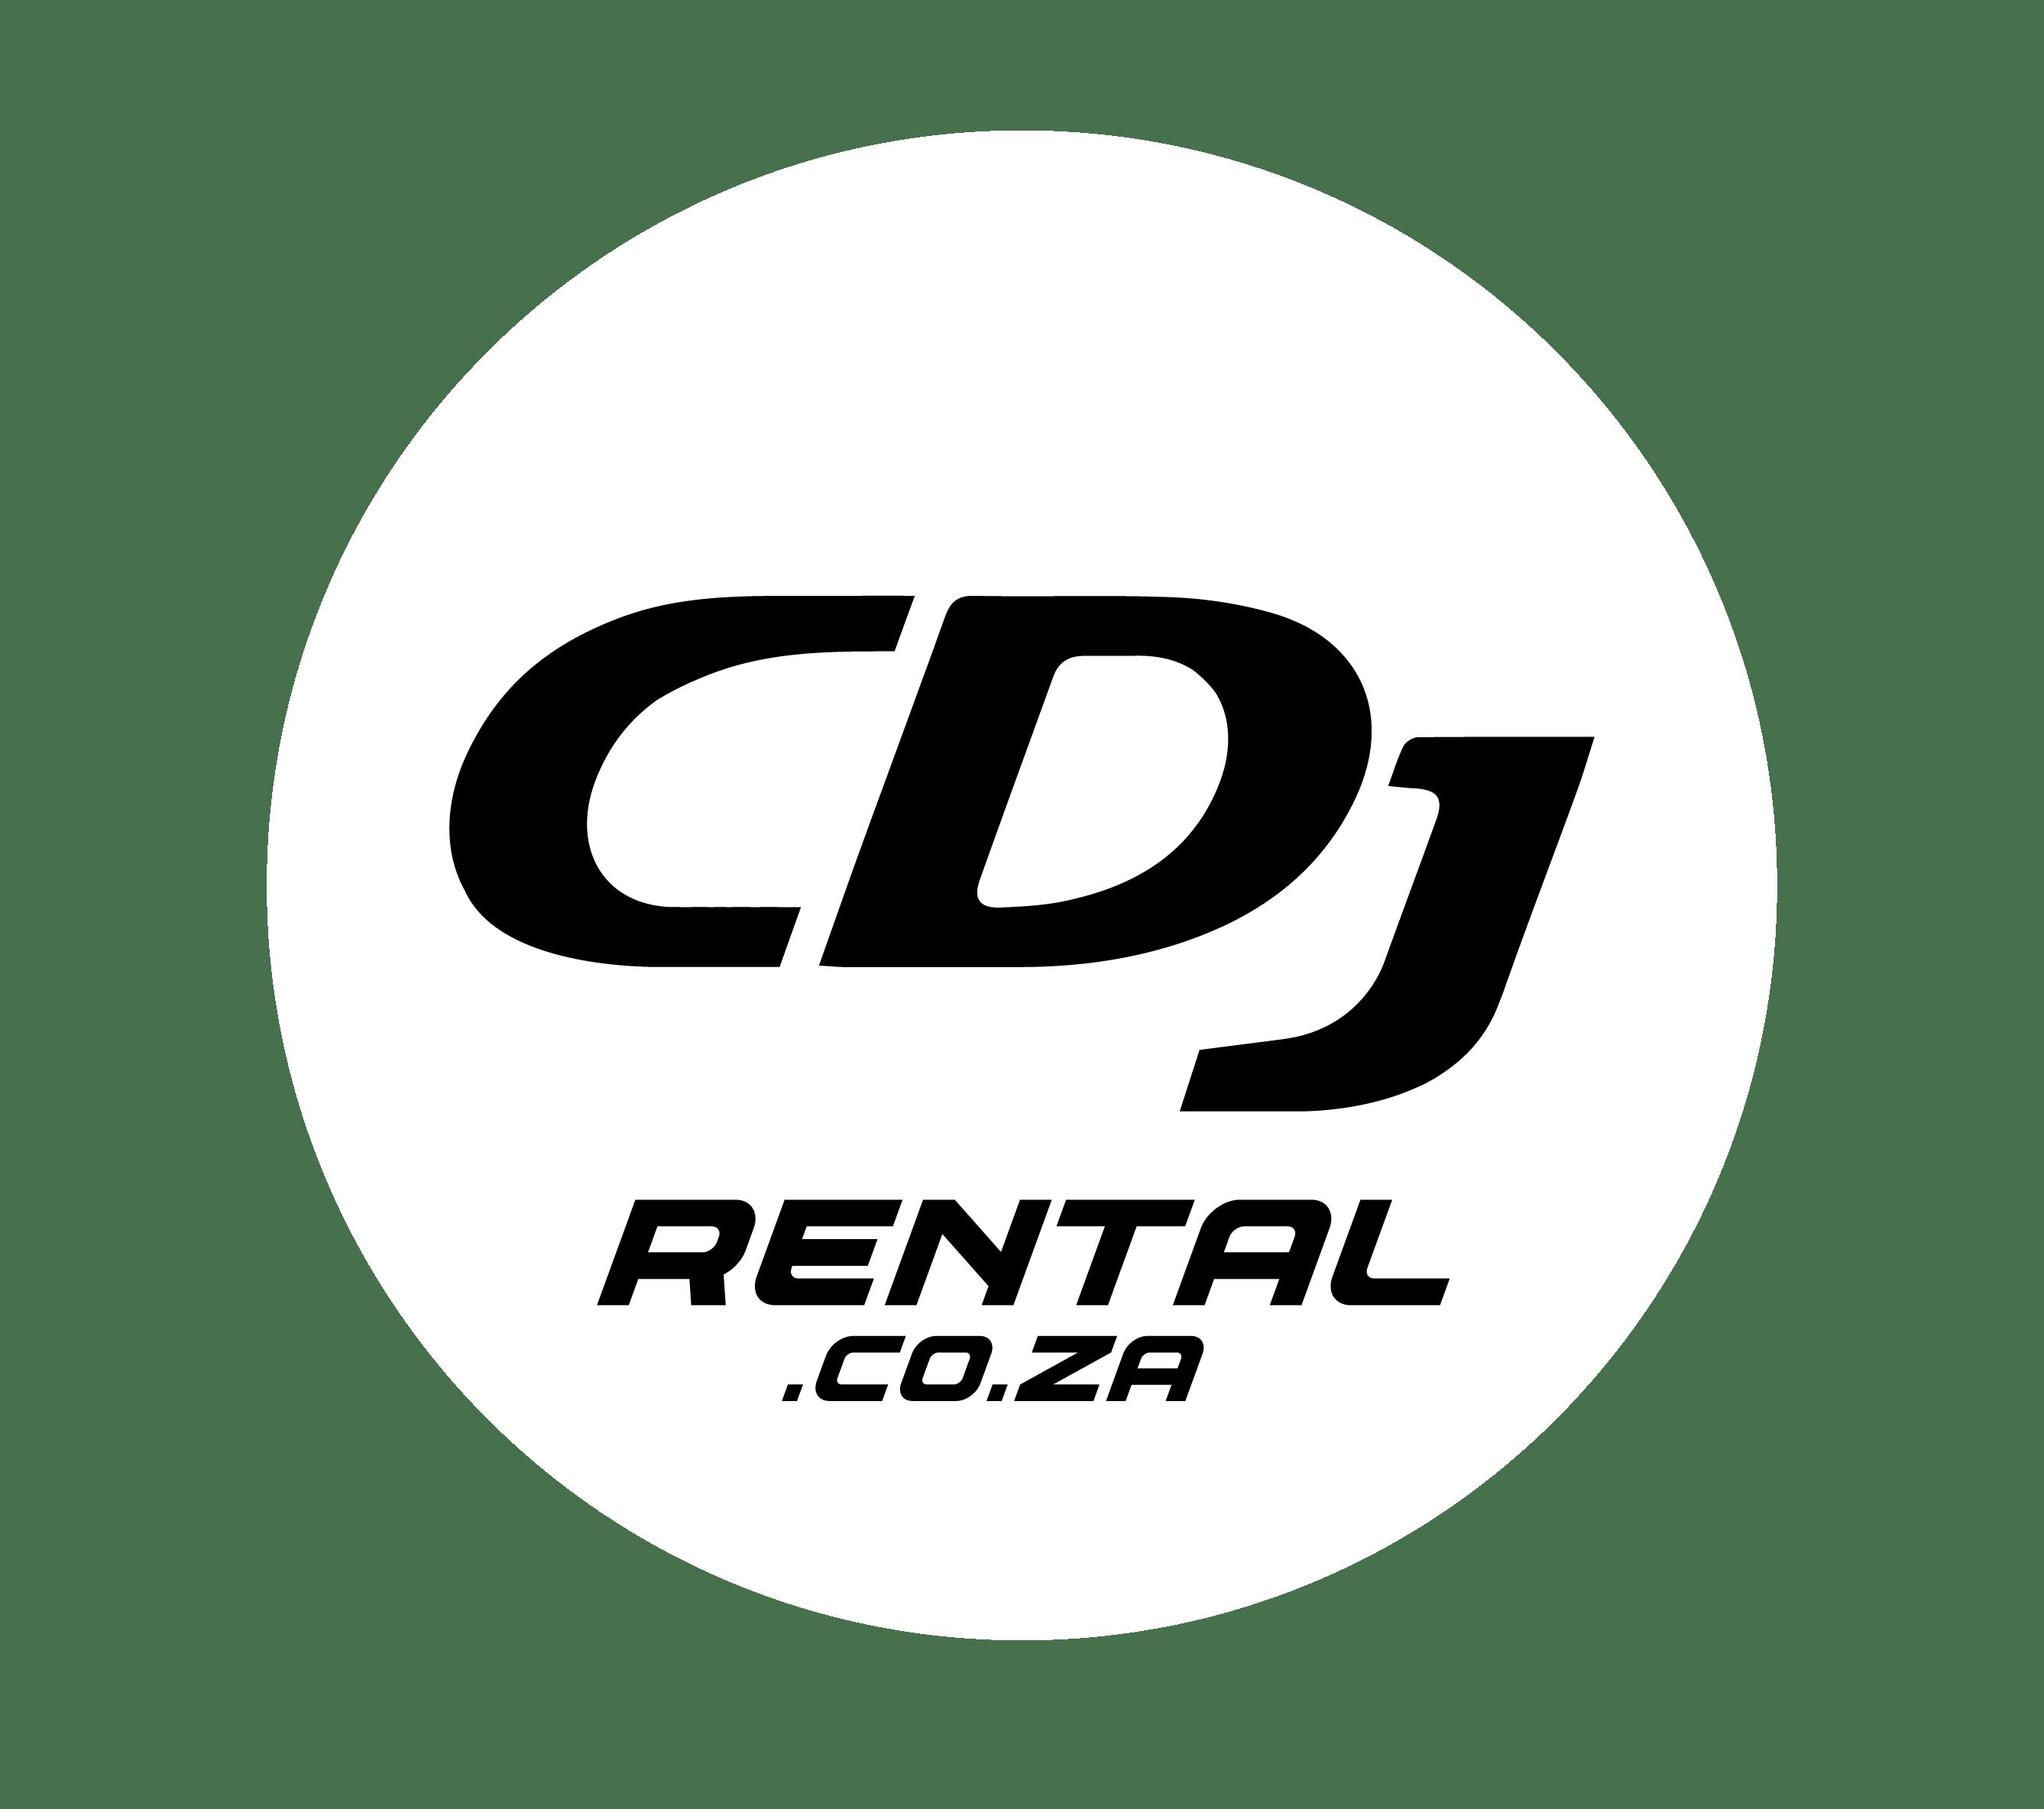 CDJrental